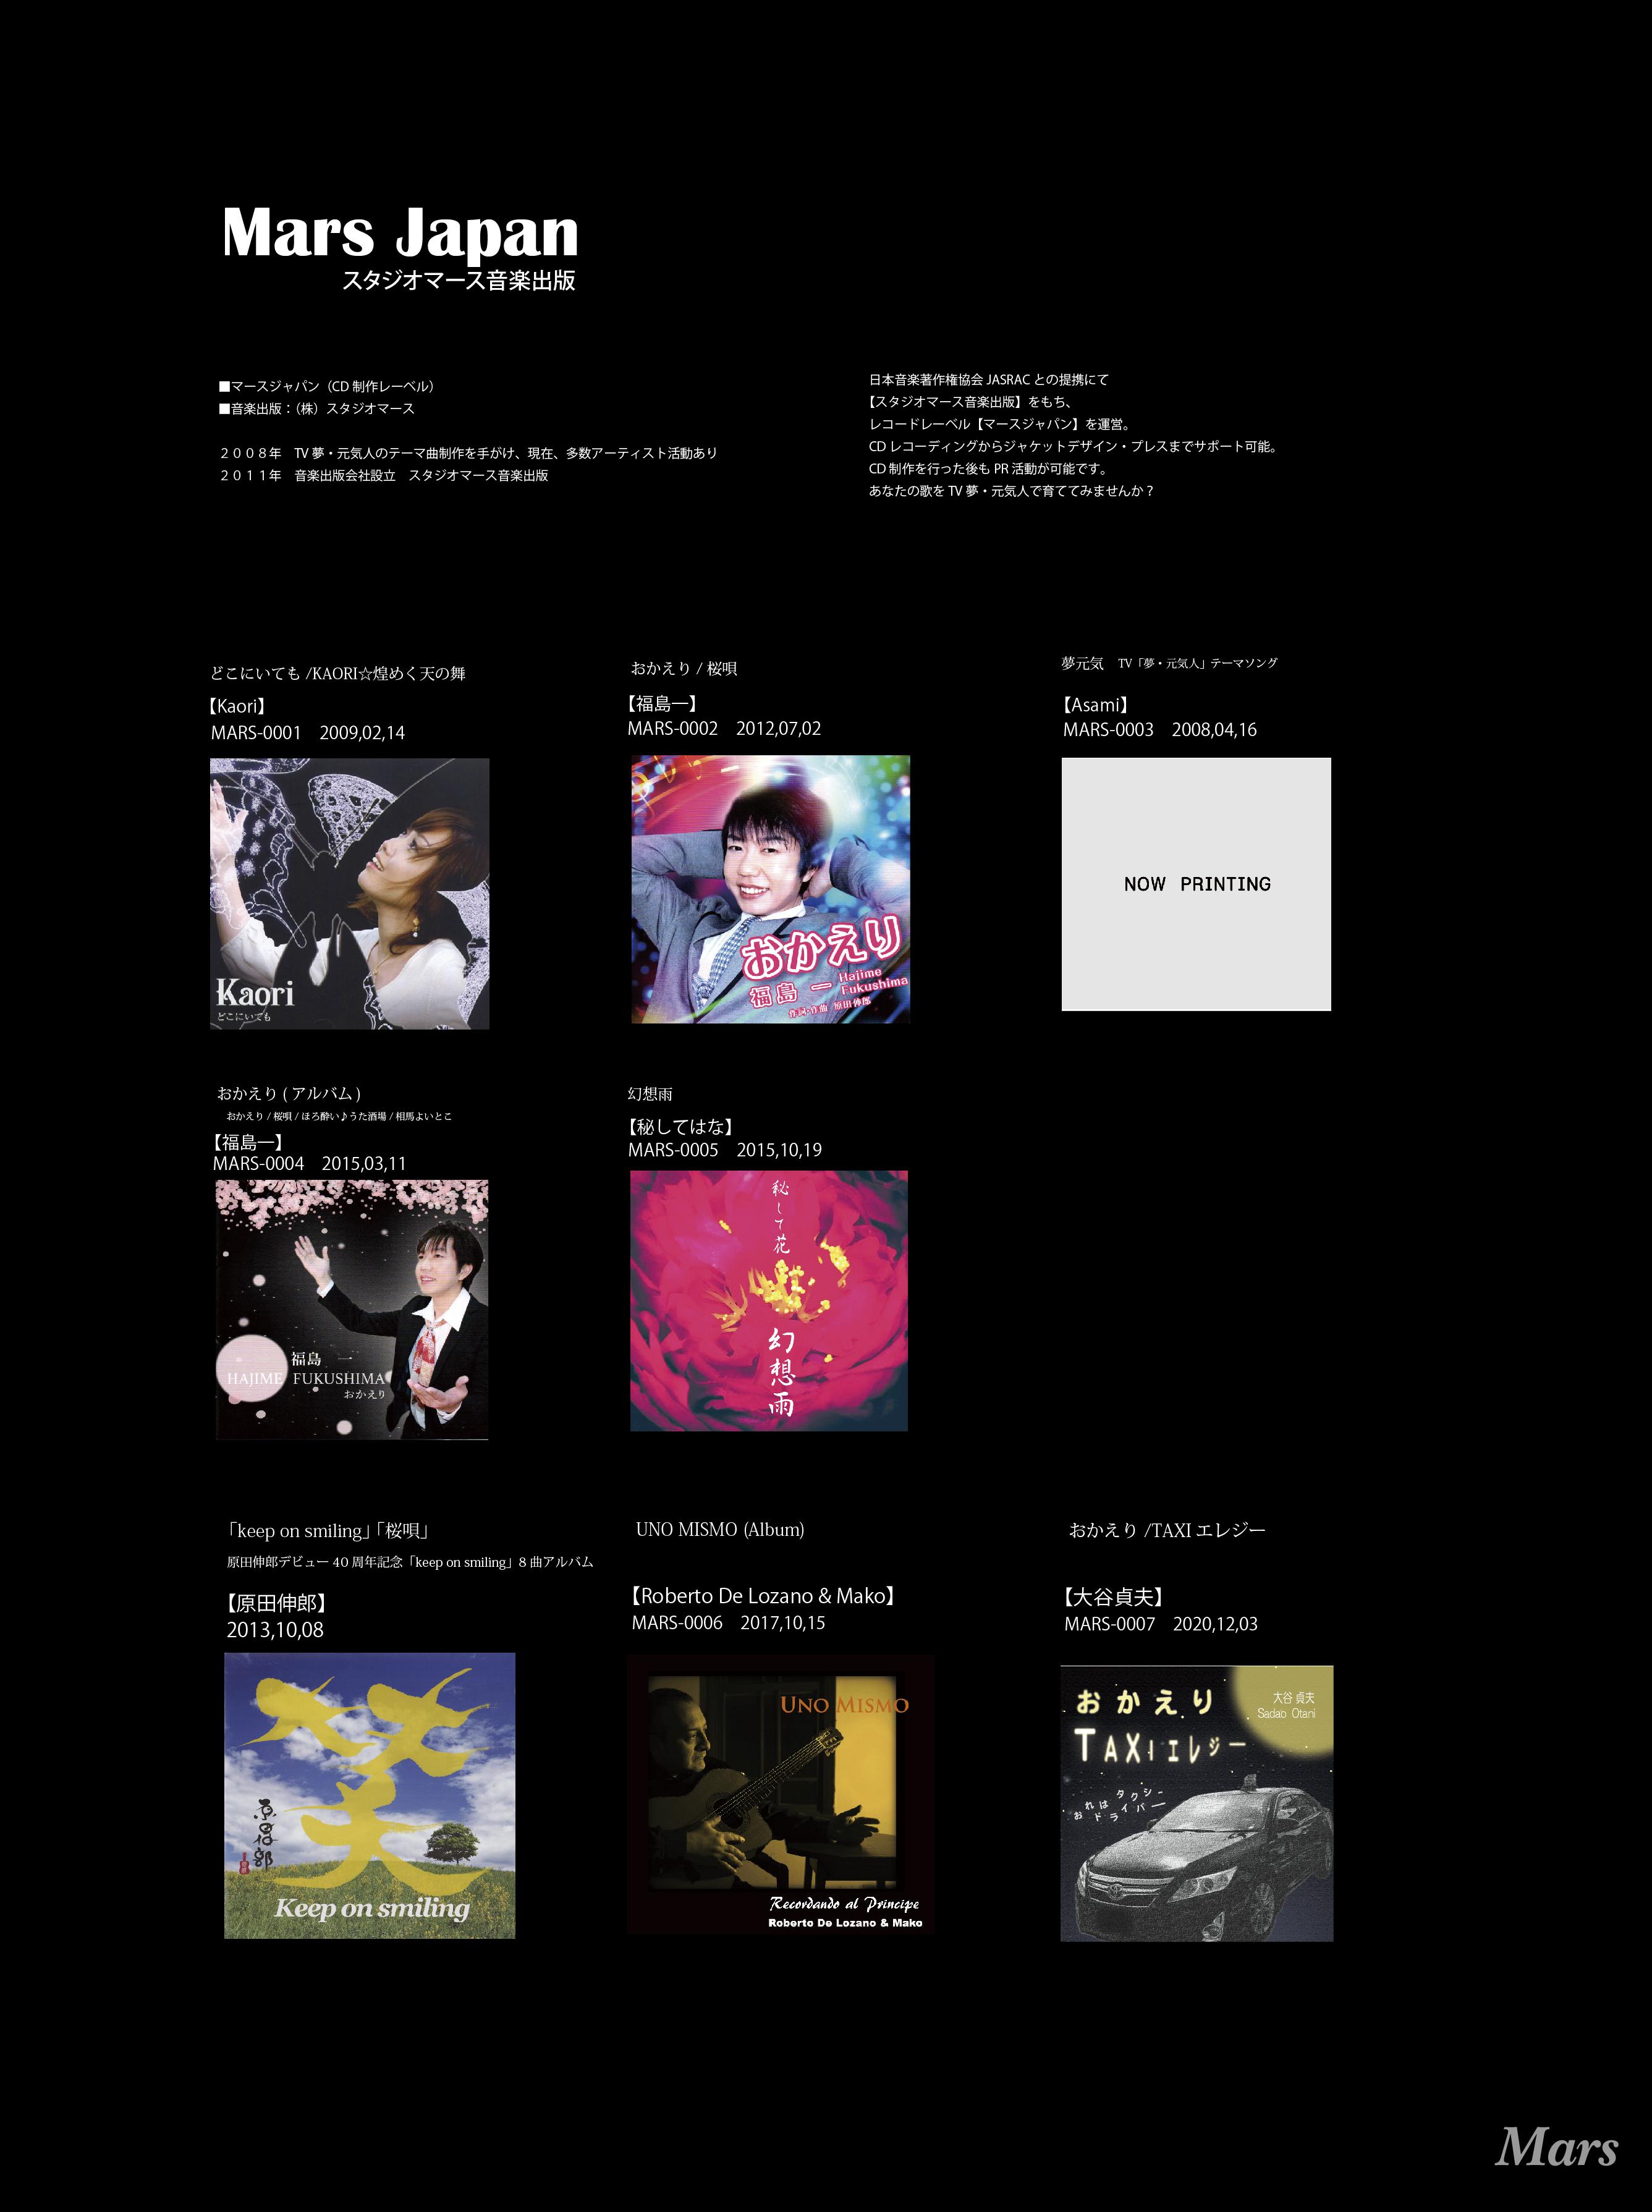 MARS JAPAN スタジオマース音楽出版-01.jpg